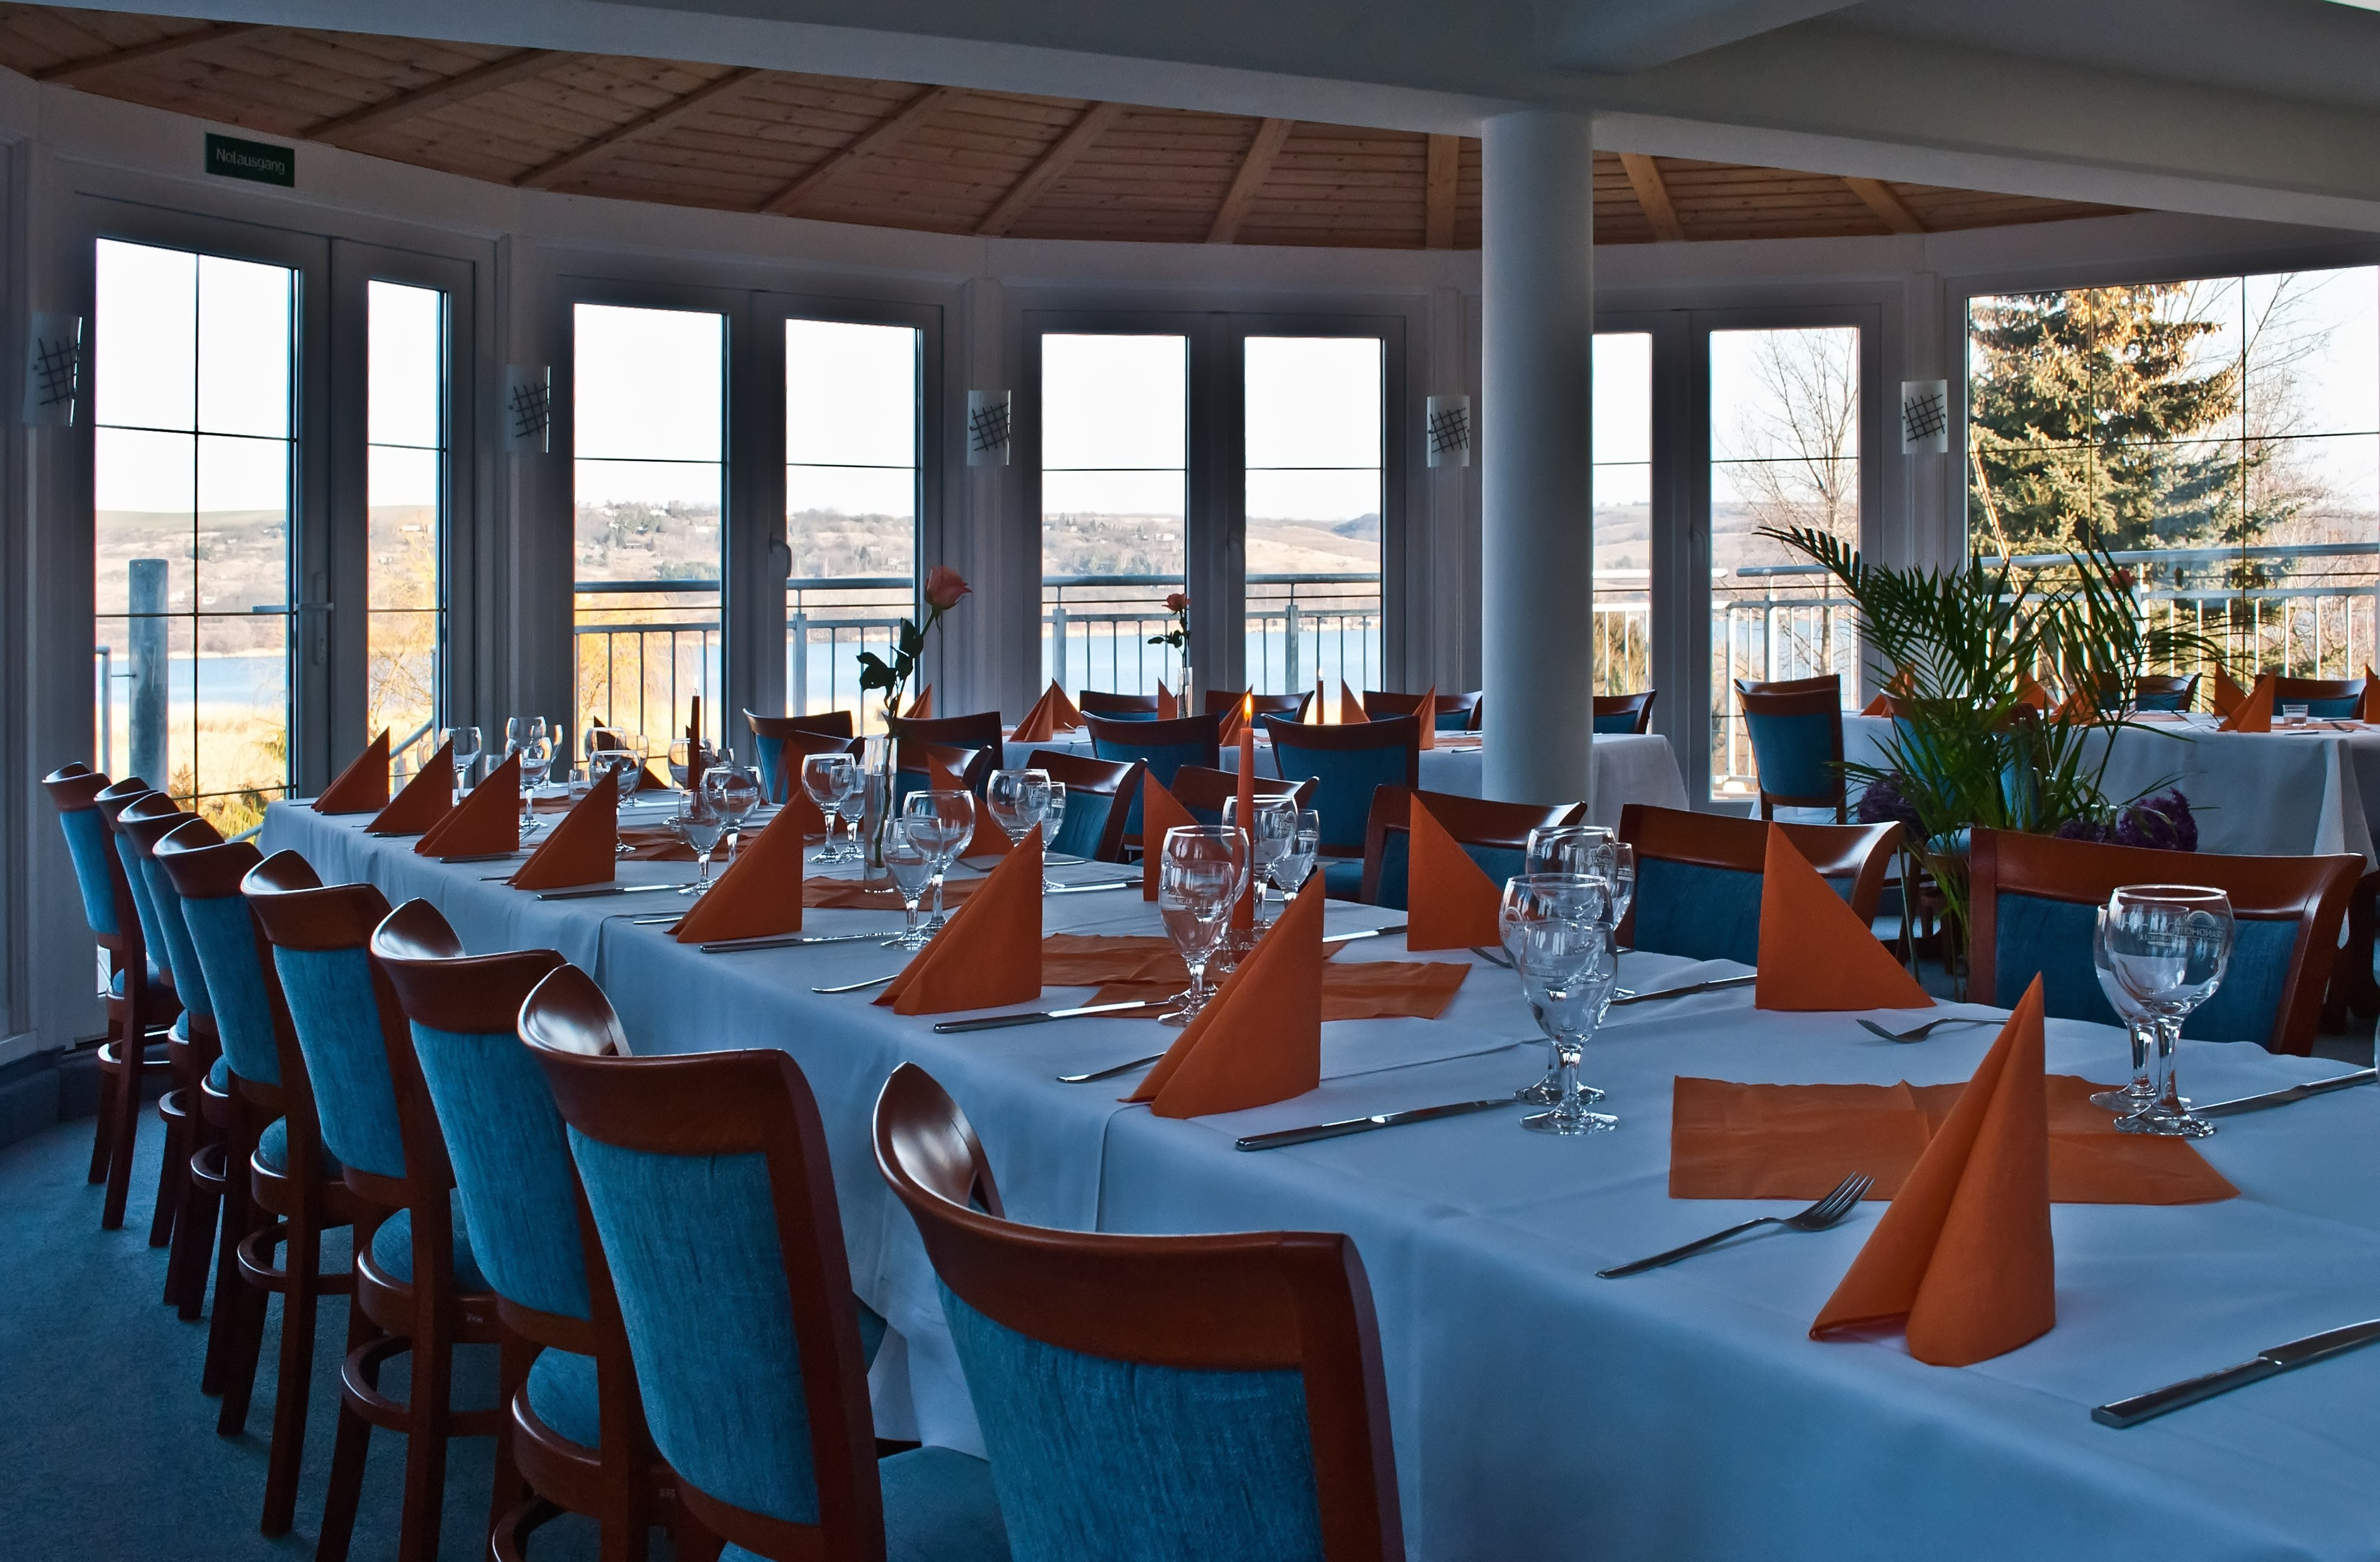 Terrassencafé im Strandhotel Aseleben